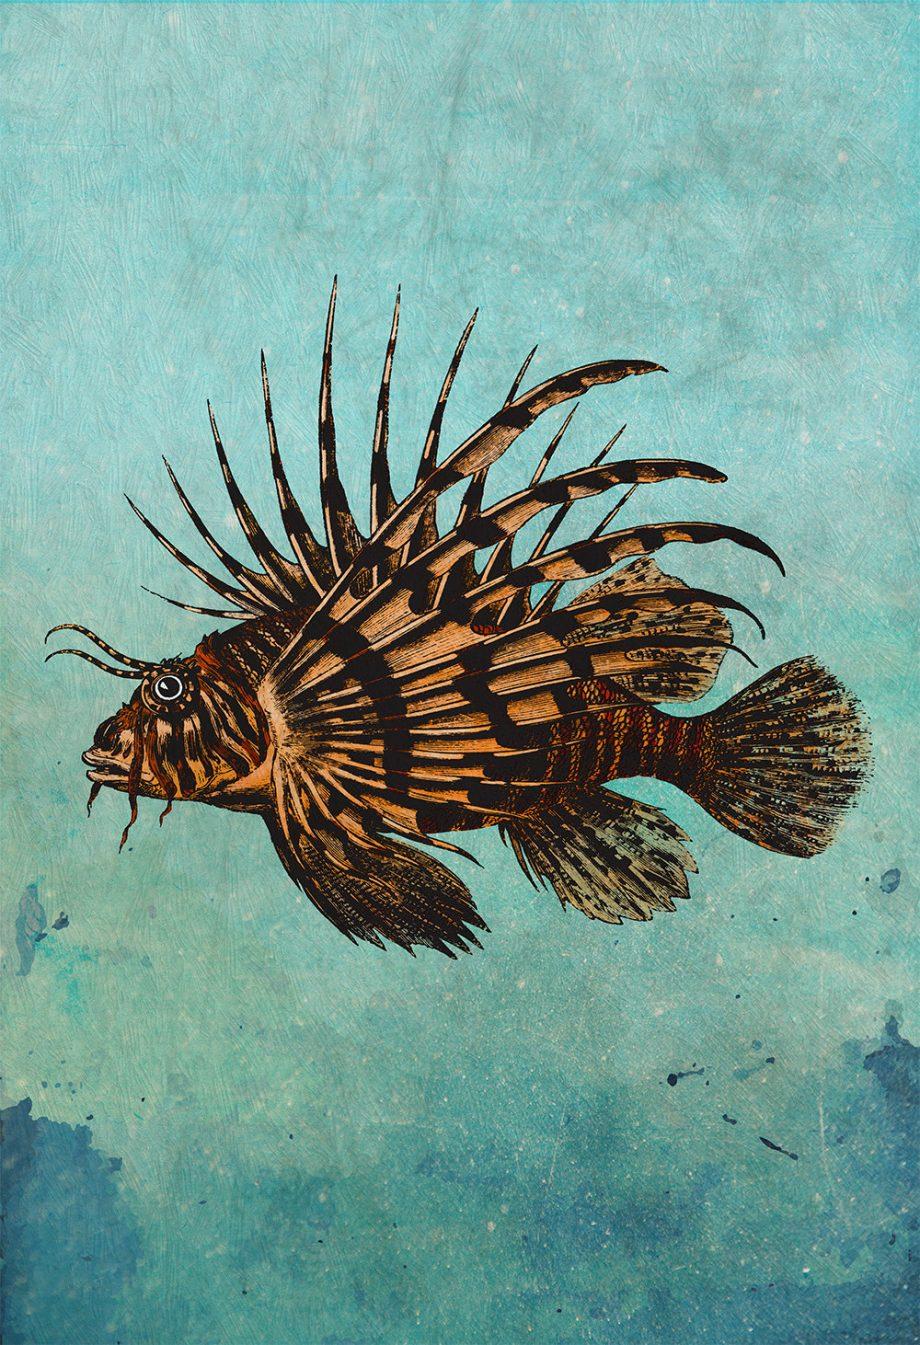 "Vintage Lion Fish Print 18x24"" 24x36"" Victorian Vintage Beach Art Print Vintage Nautical Decor Ocean Wall Art Giclee Print on Canvas & Satin"